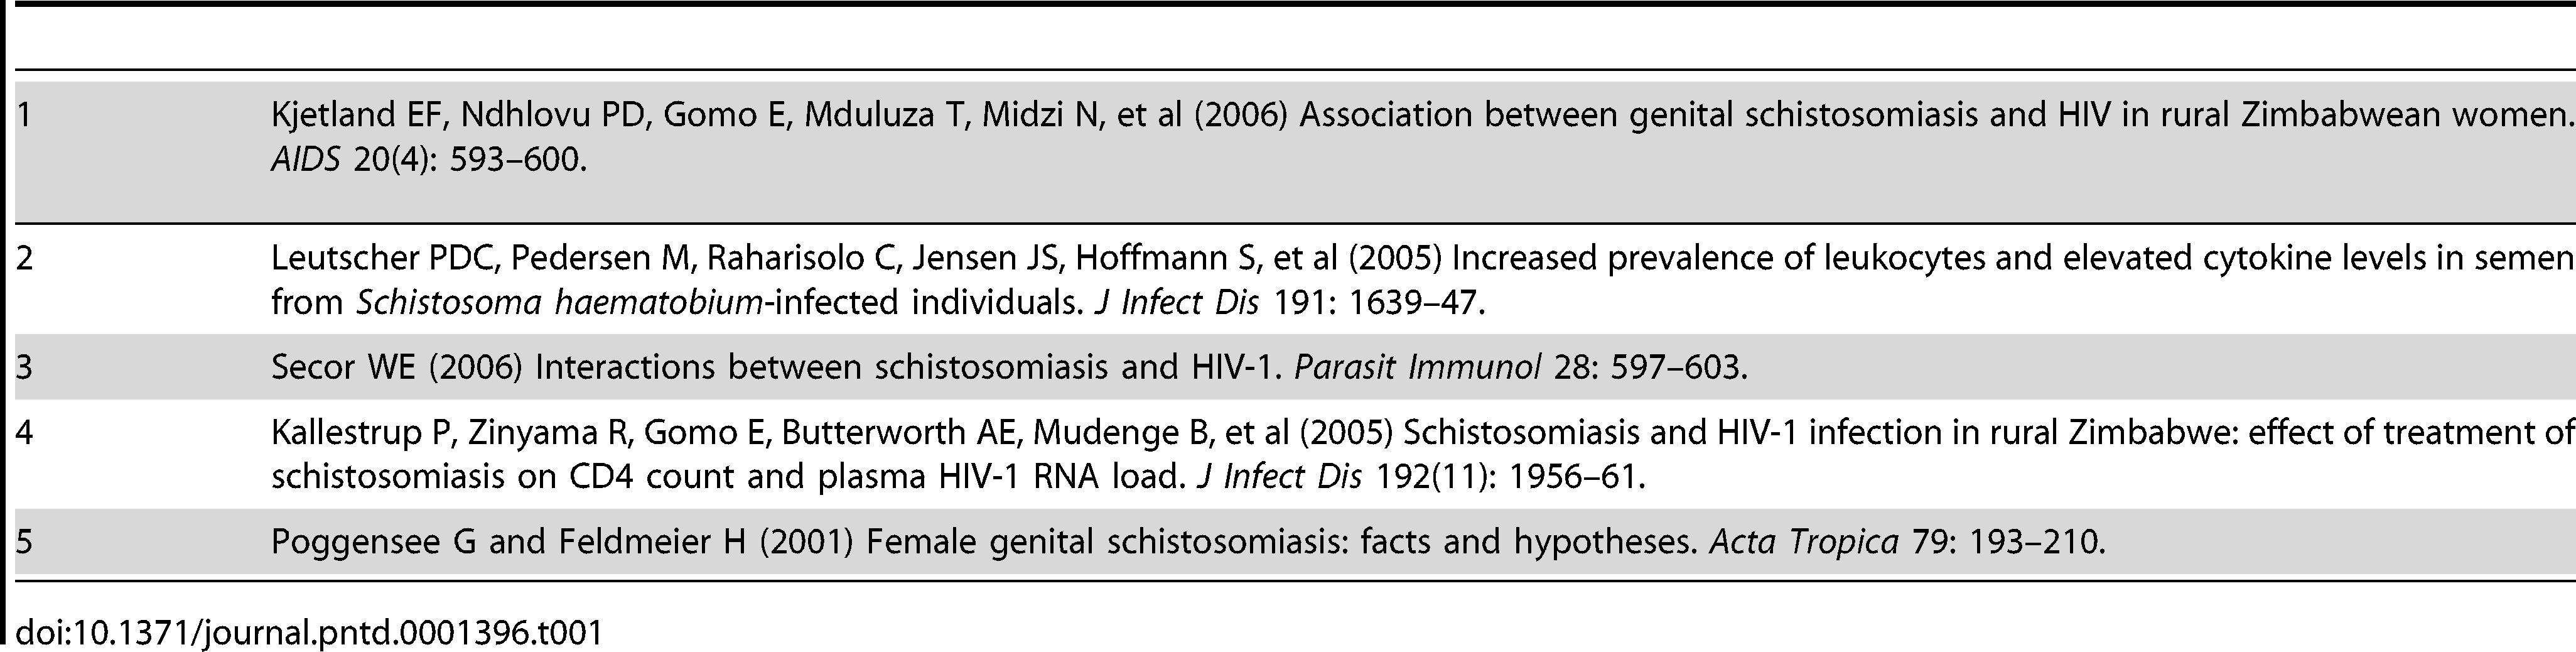 schistosomiasis and hiv